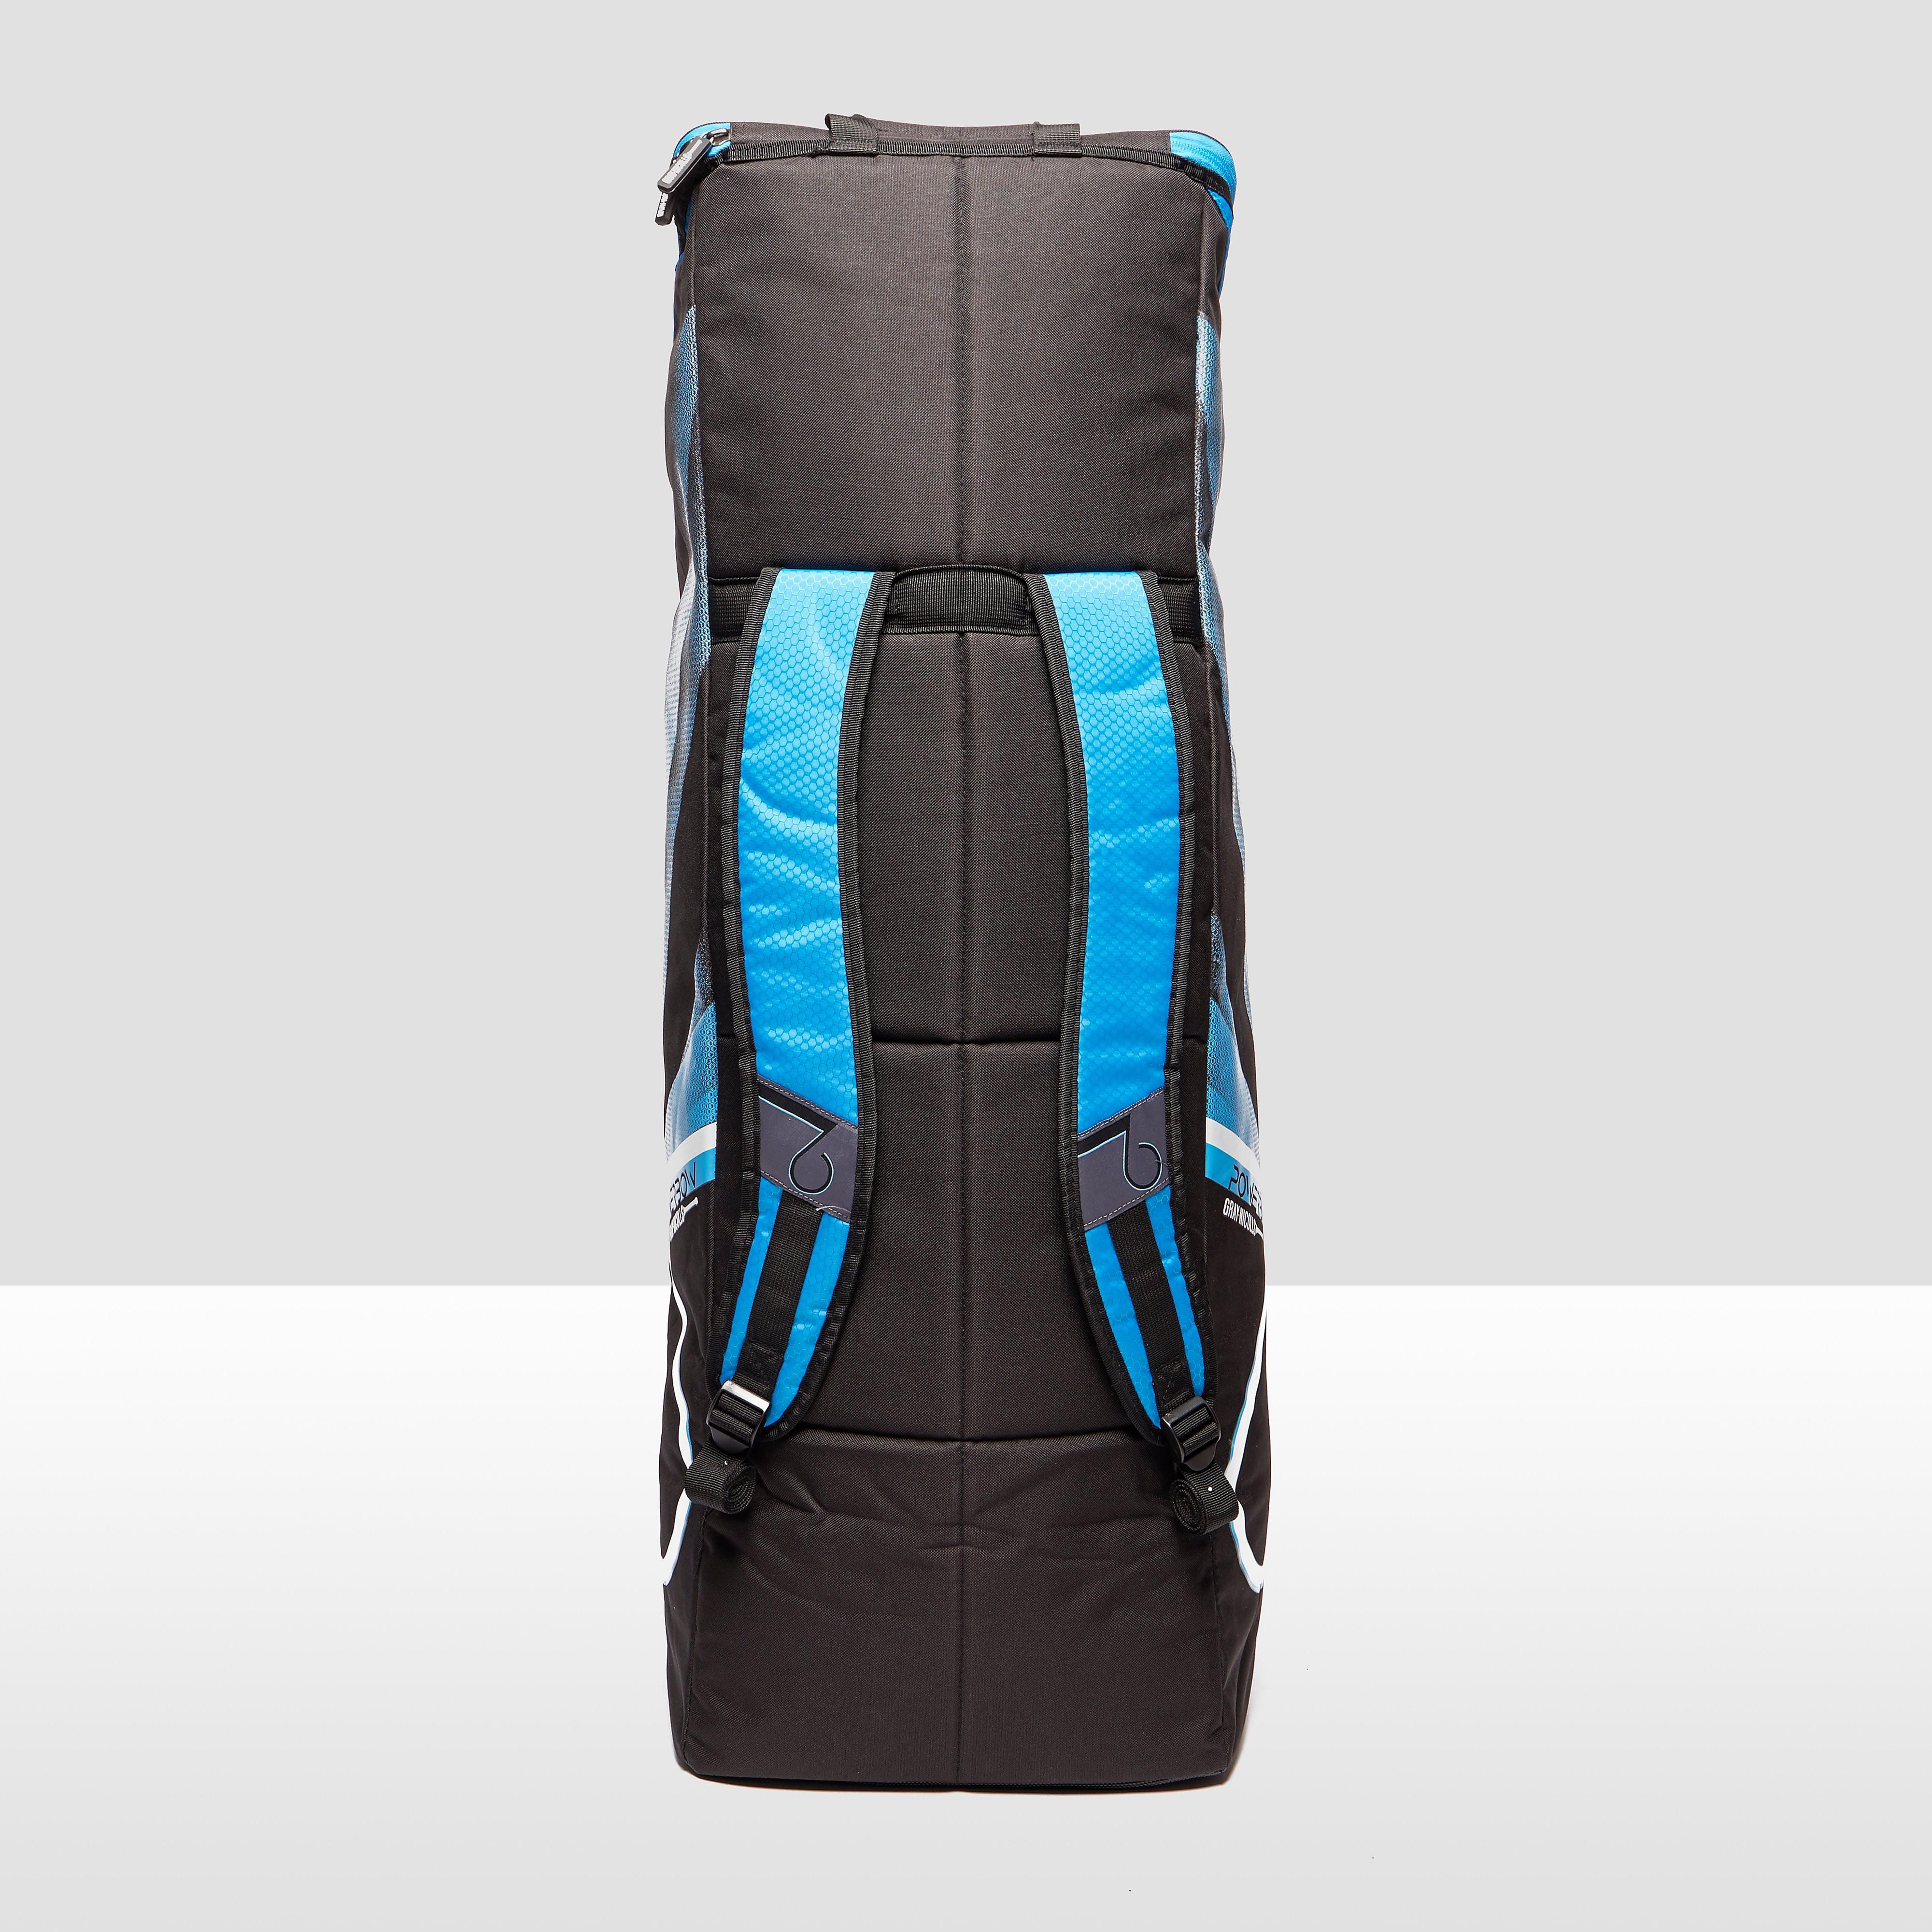 Gray Nicolls Powerbow 6 500 Duffle Bag